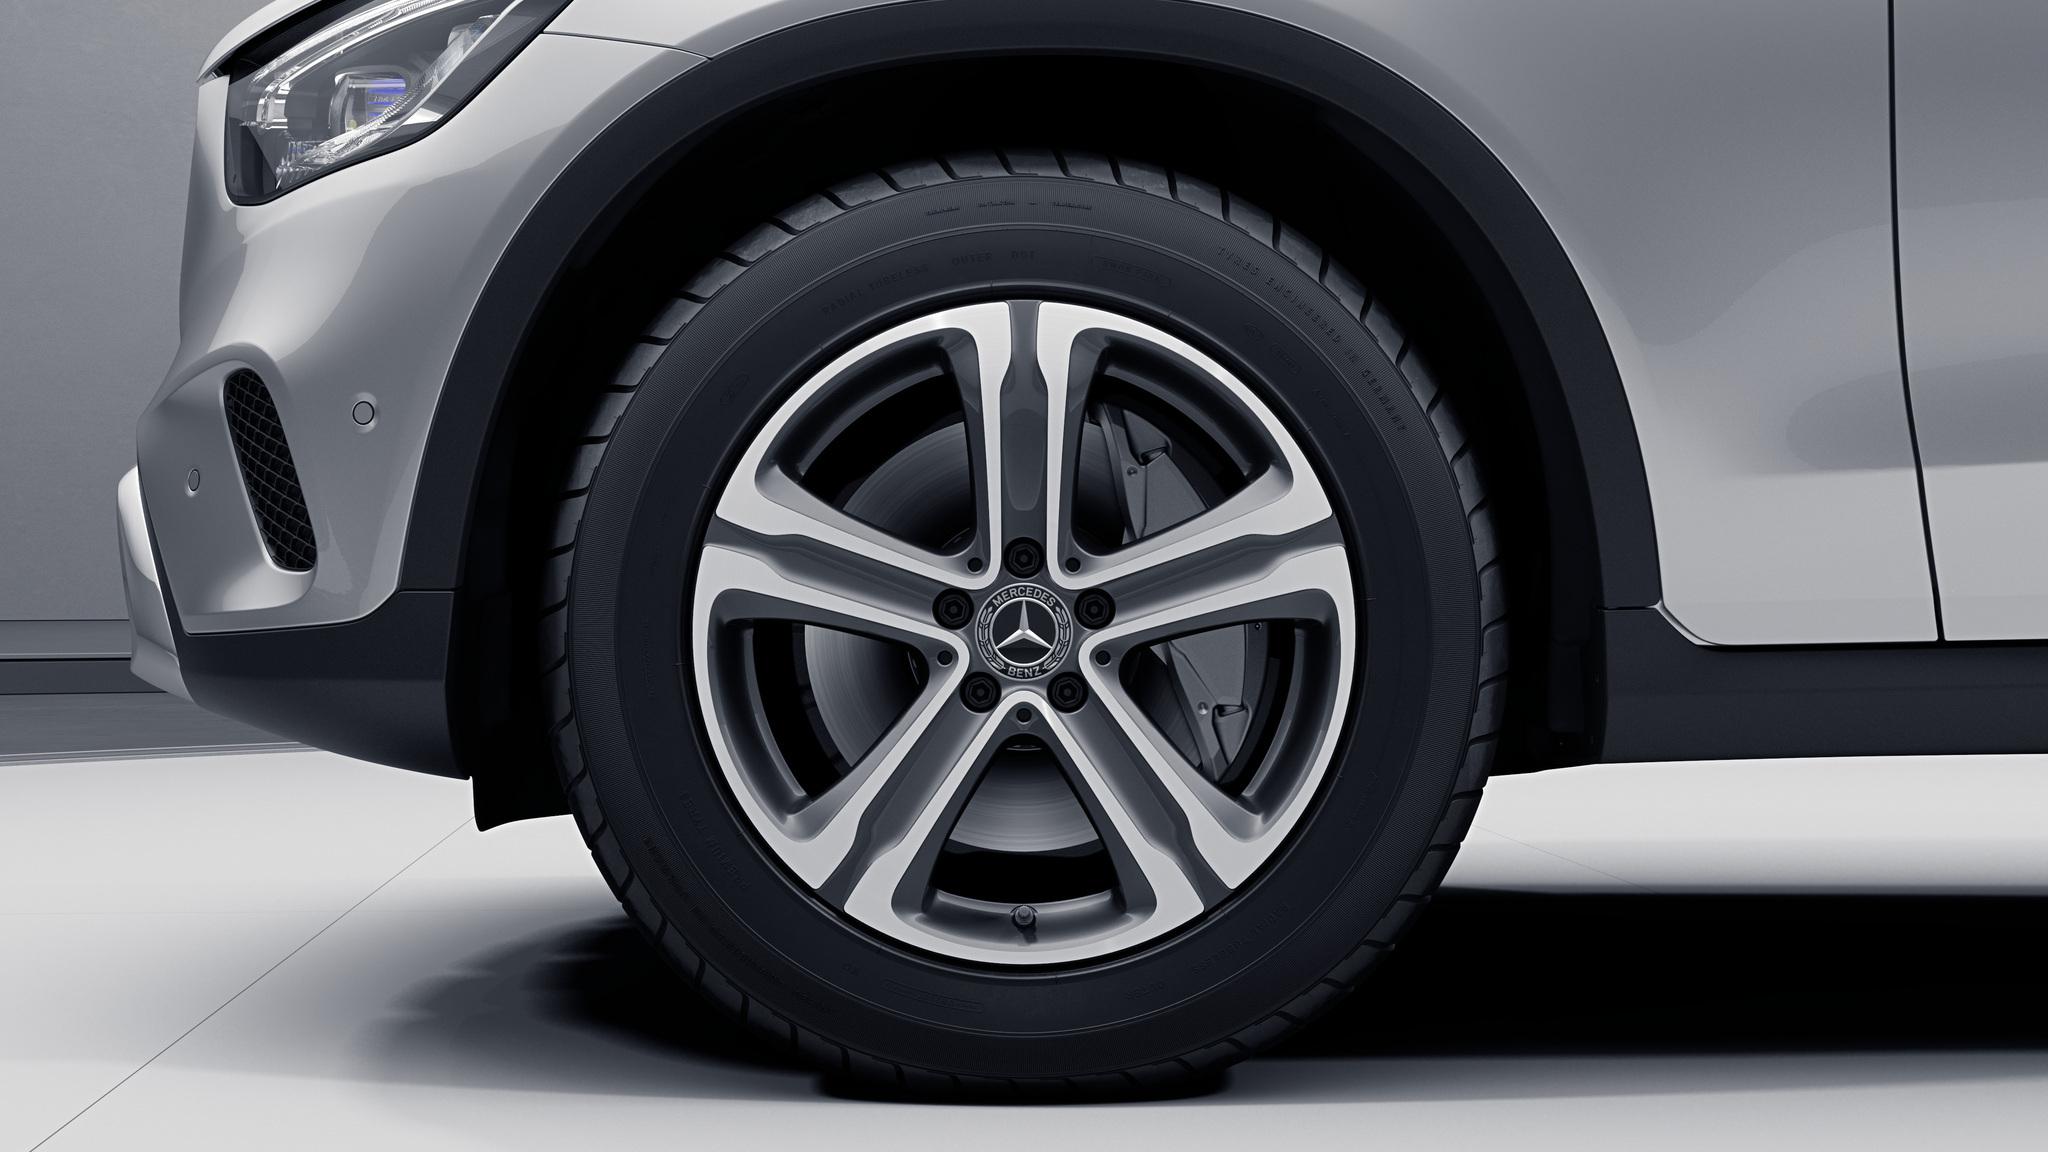 Jantes de la Mercedes-Benz GLC Finition 4 Matic Dynamic